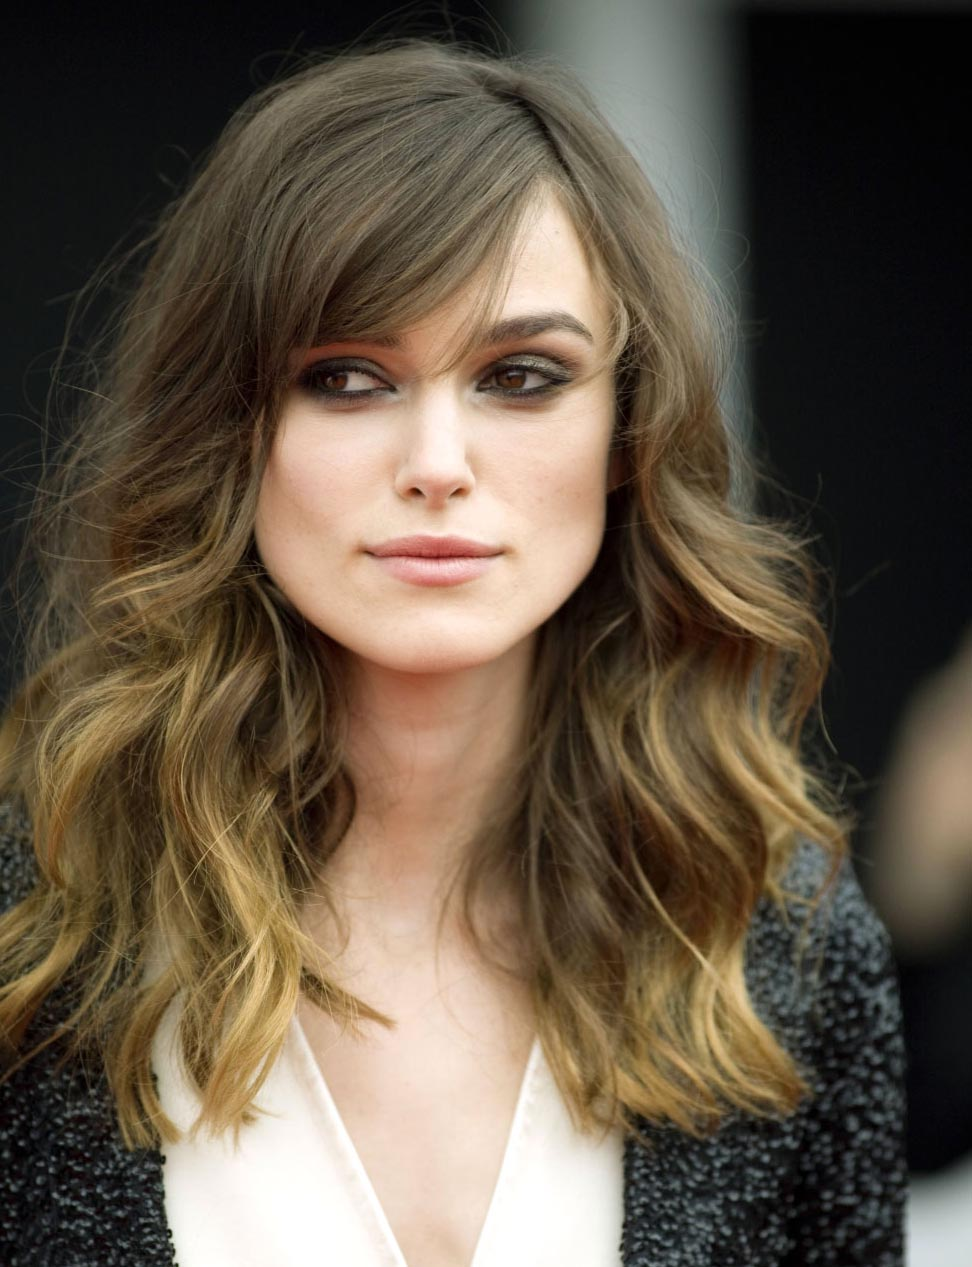 Stupendous Top 10 Best Hairstyles For Big Foreheads Female Short Hairstyles Gunalazisus